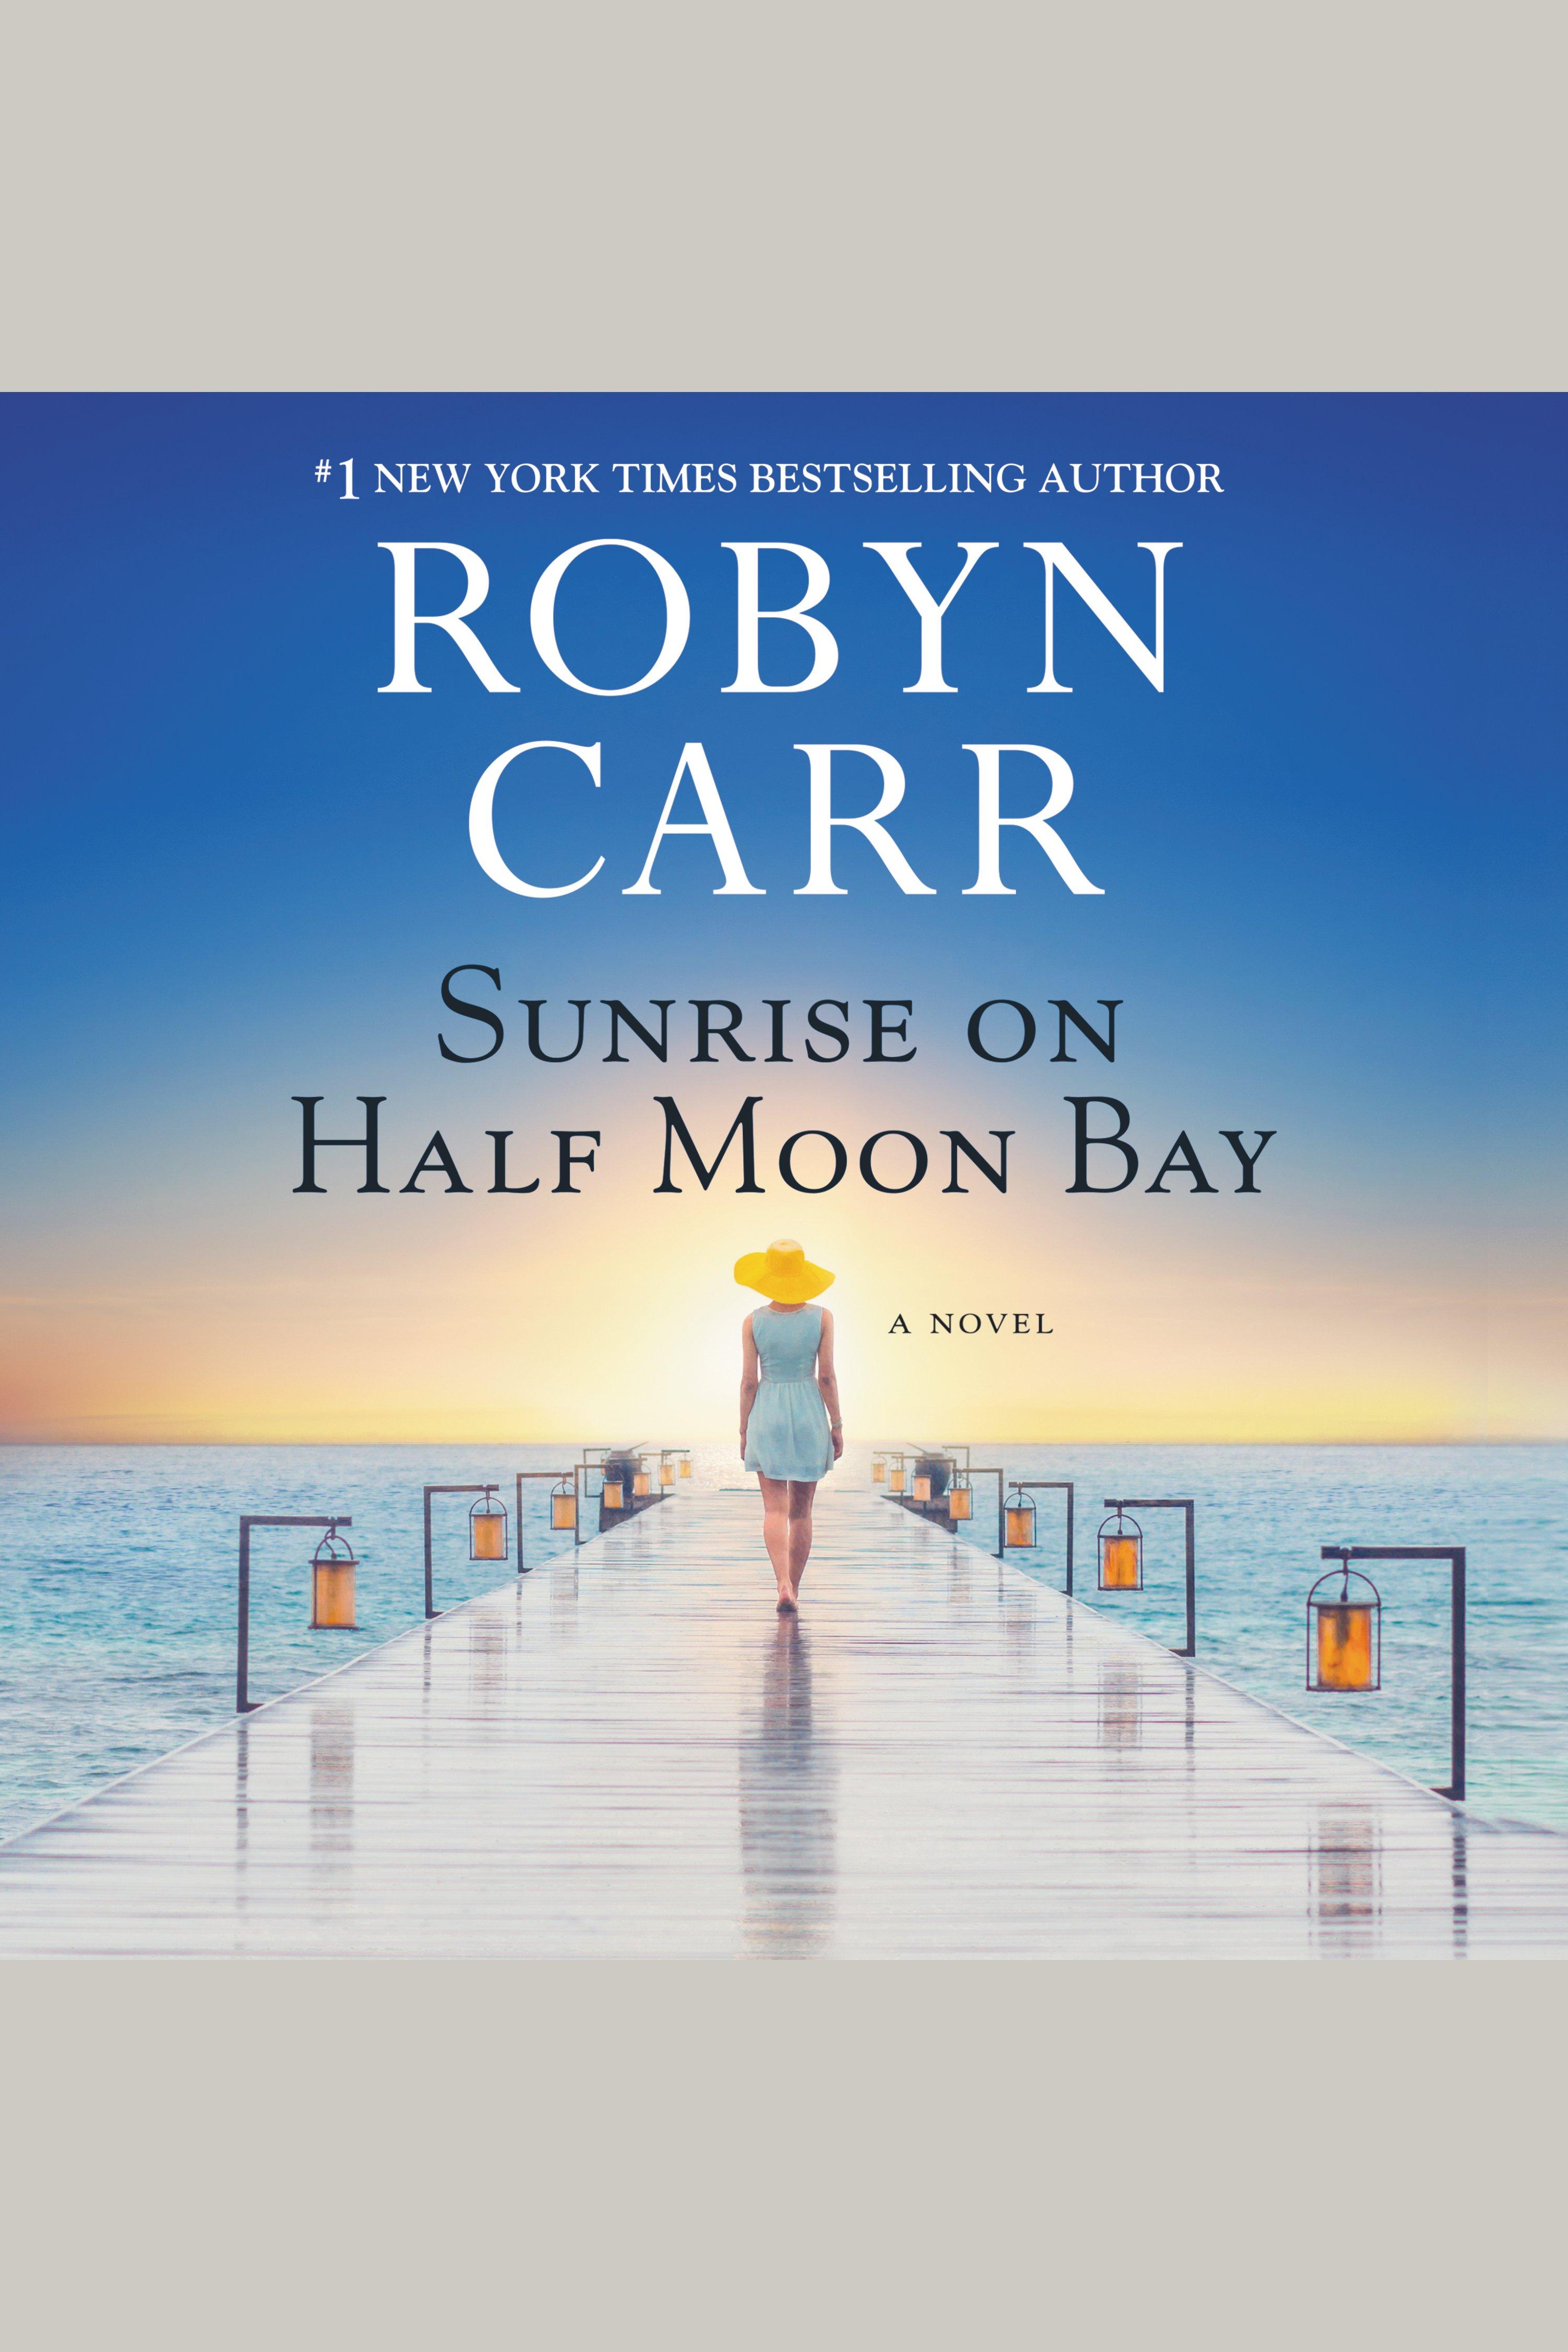 Cover Image of Sunrise on Half Moon Bay